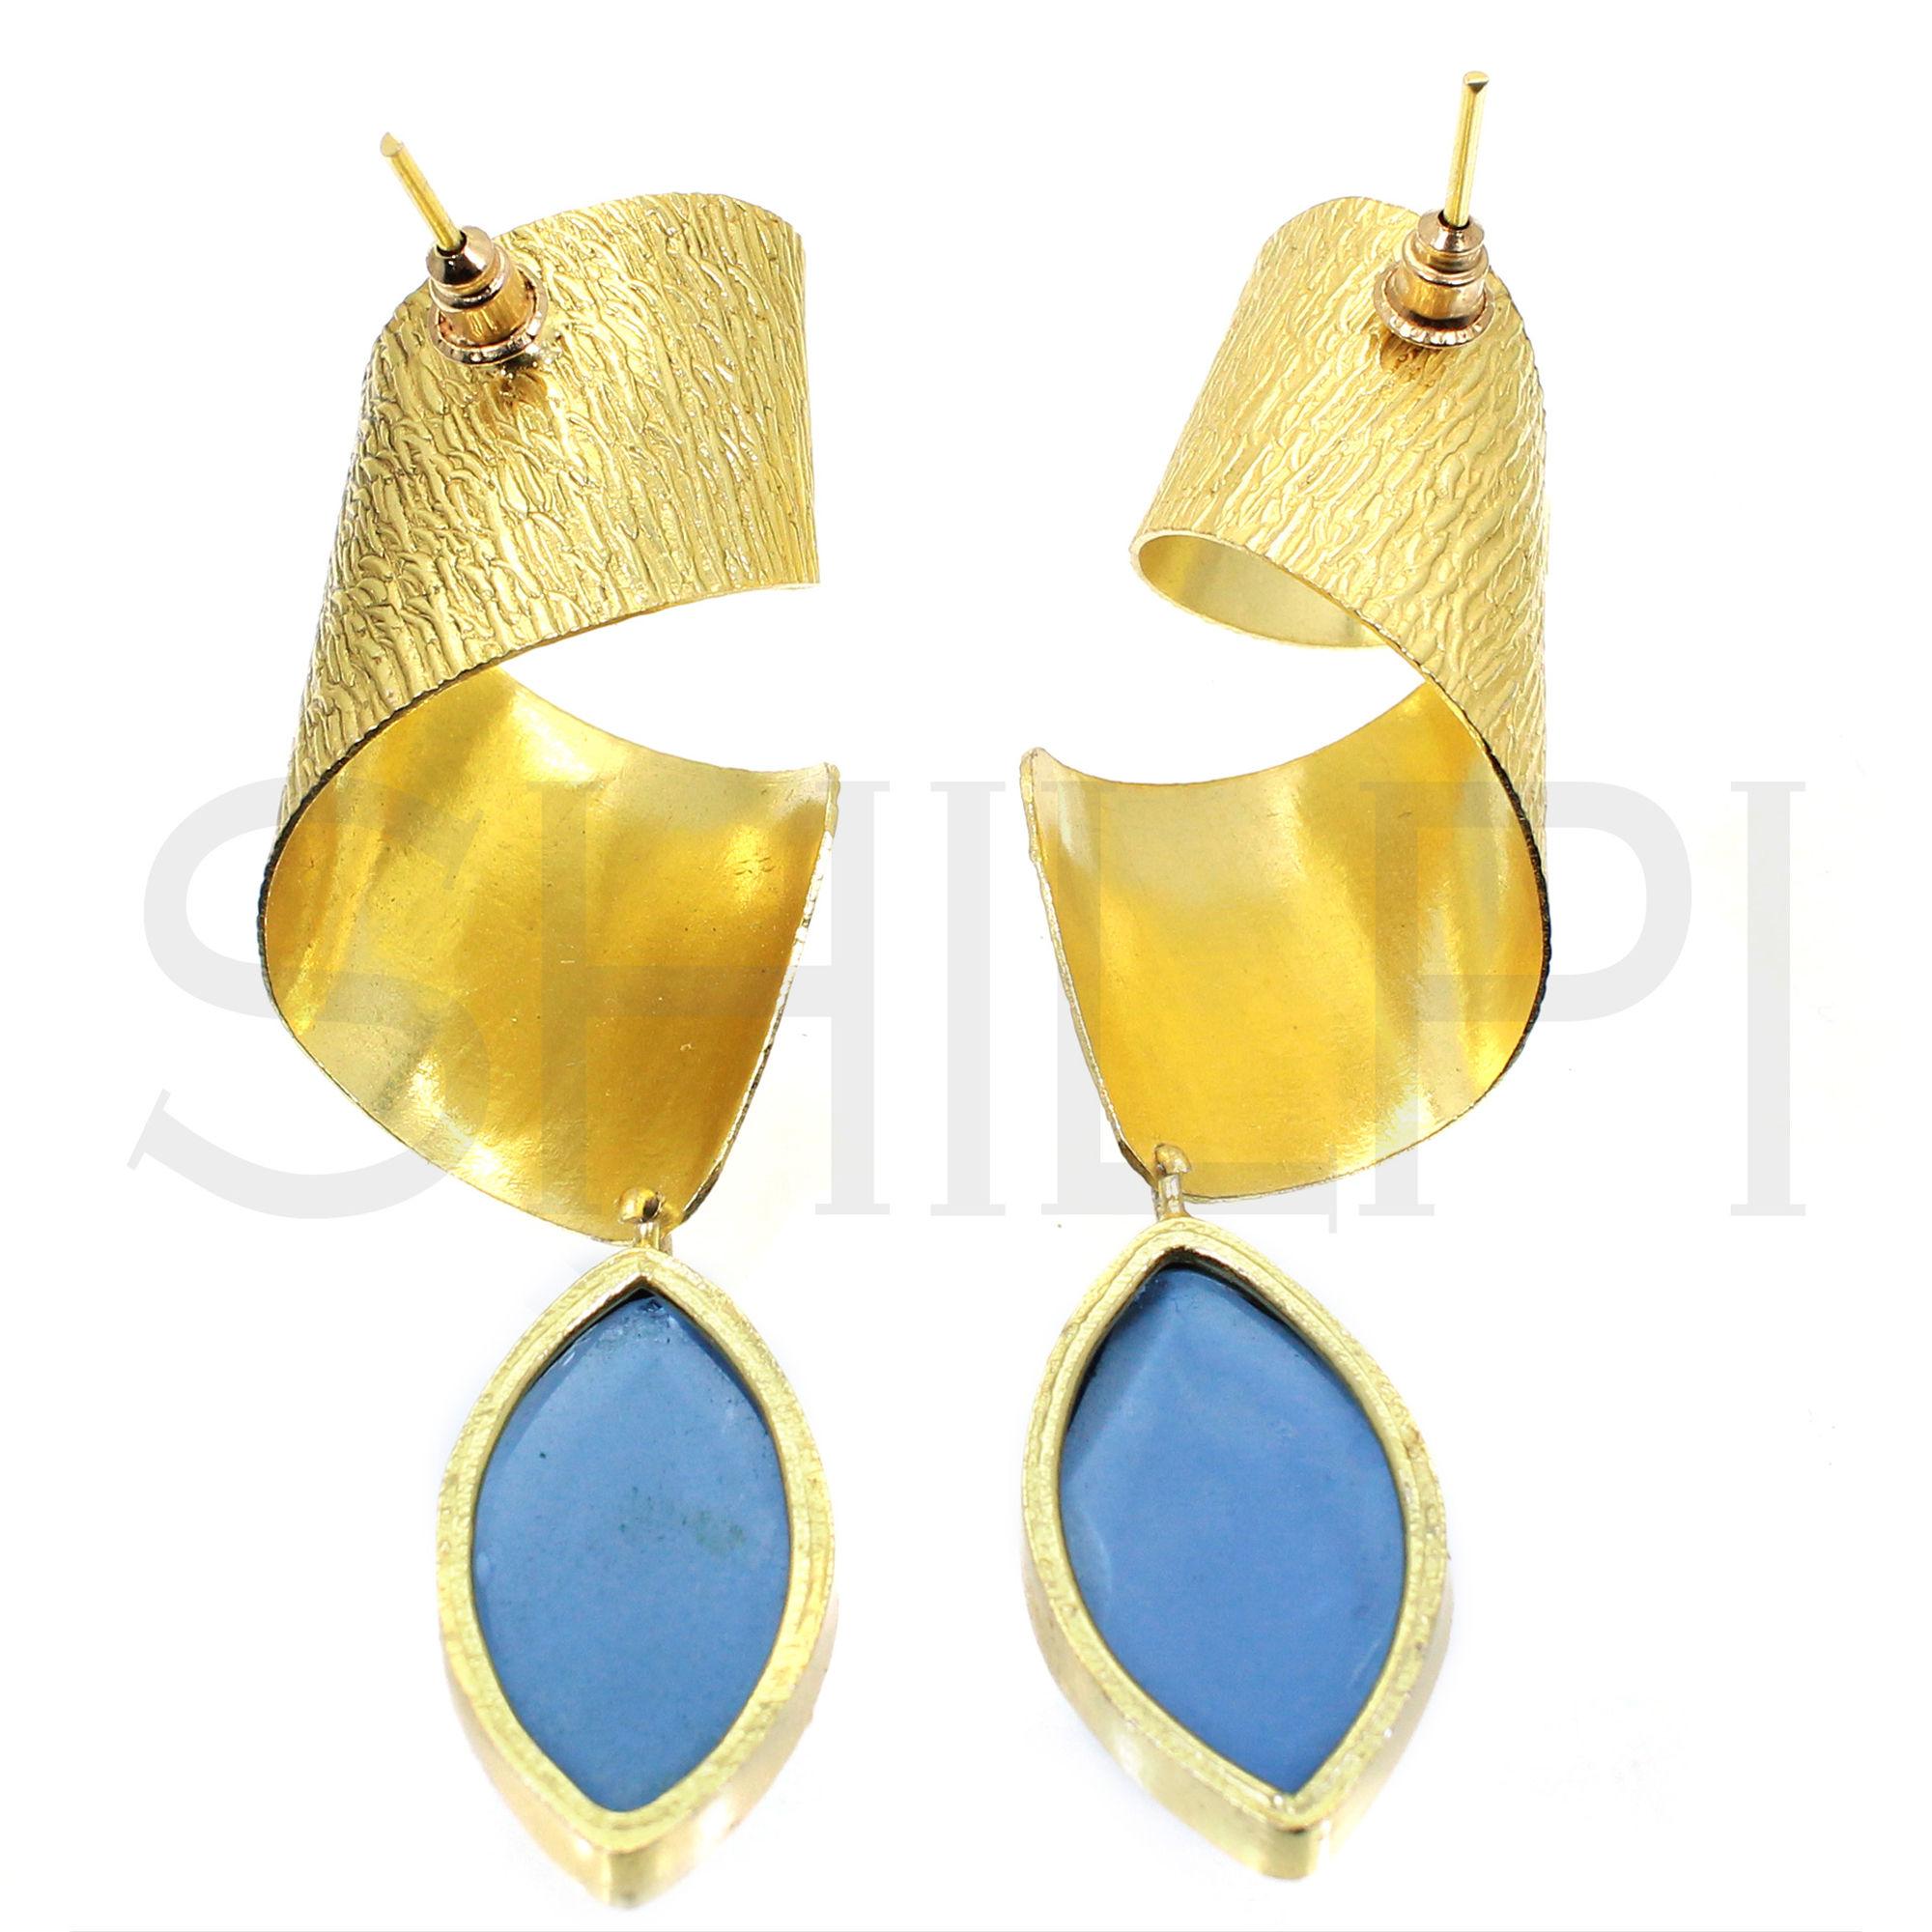 London Blue Topaz Hydro Gold Plated Handmade Twisted Design Stud Earrings